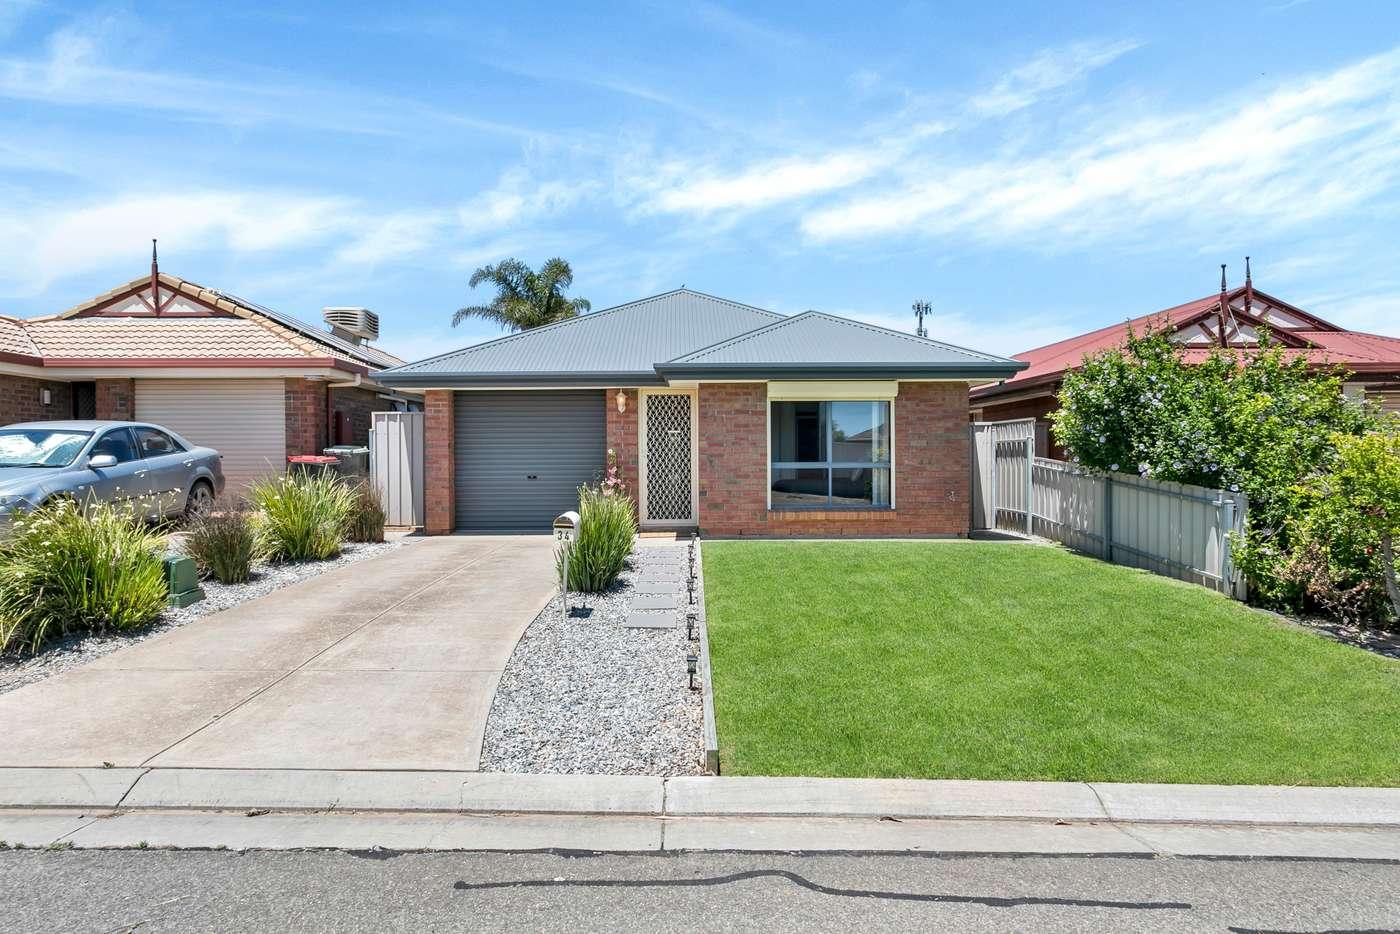 Main view of Homely house listing, 34 Carlisle Circuit, Seaford SA 5169